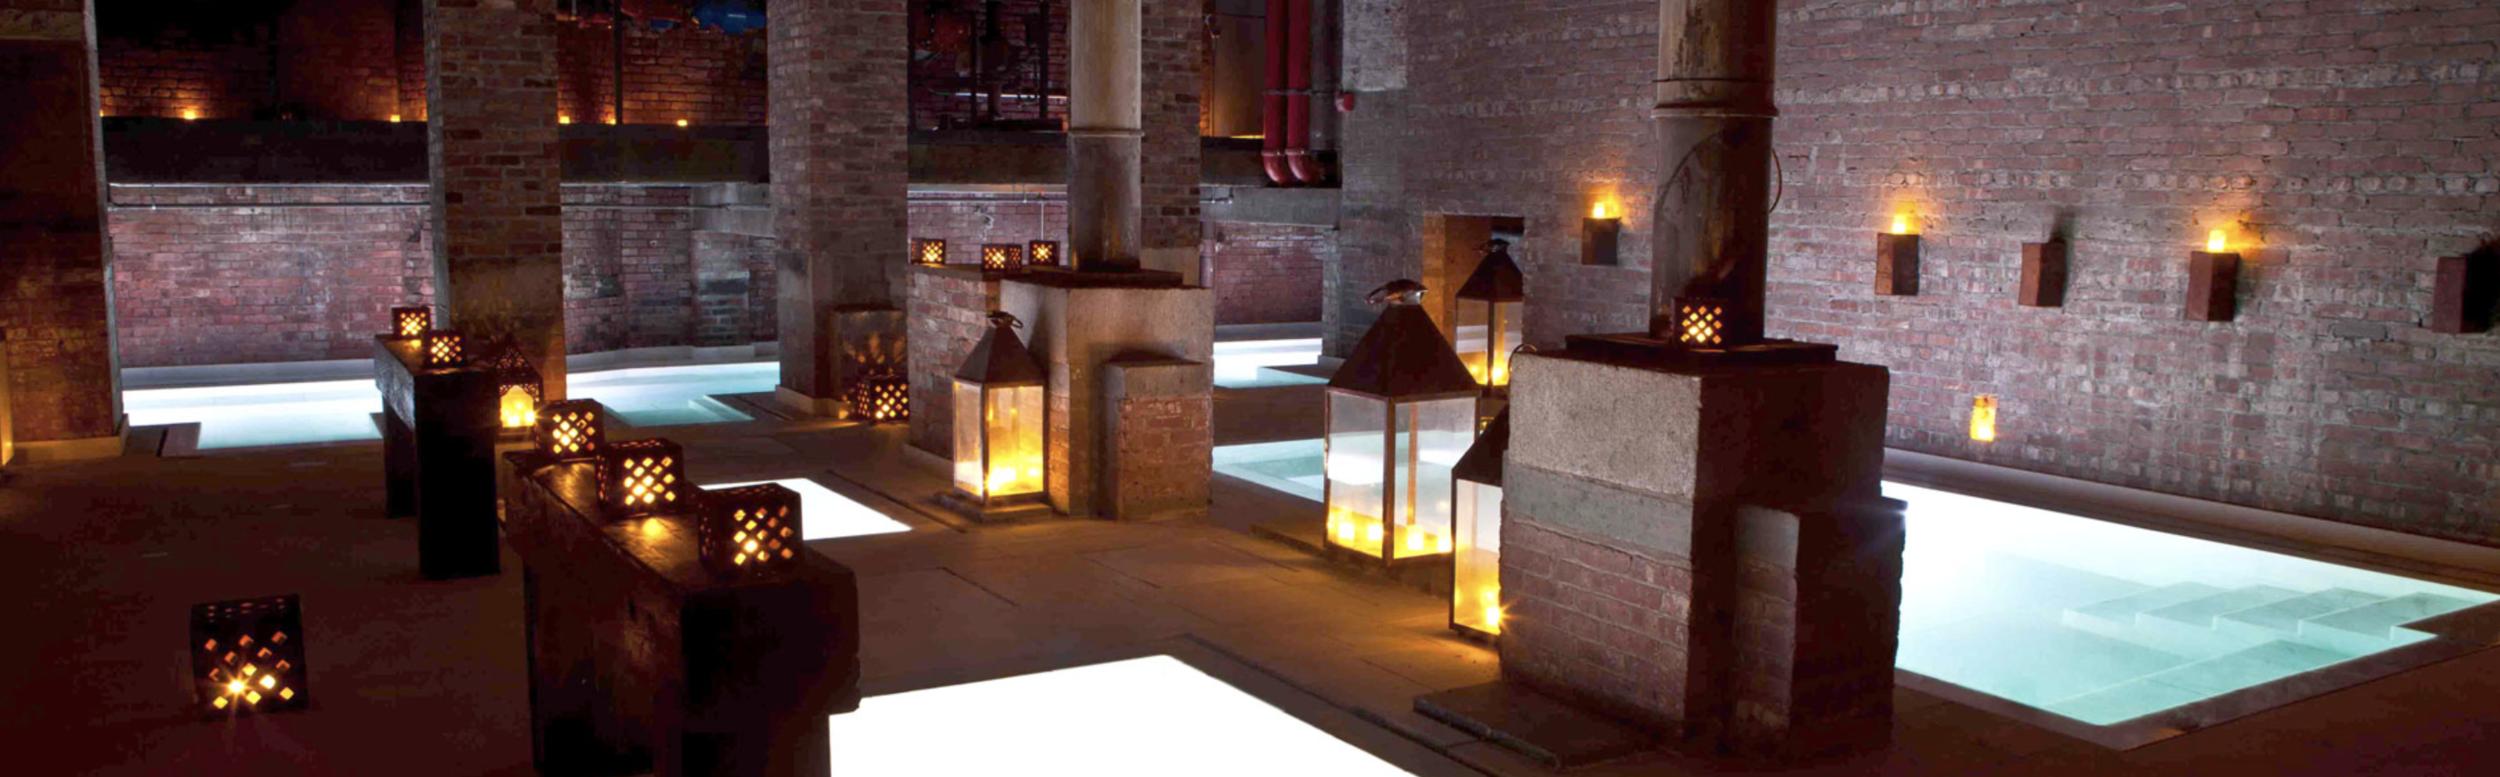 SPA & WELLNESS_  BEAIRE - ANCIENT BATH..  #AncientBath #Wellness #Spa #Relaxation #Interiors   https://beaire.com/en/aire-ancient-baths-newyork